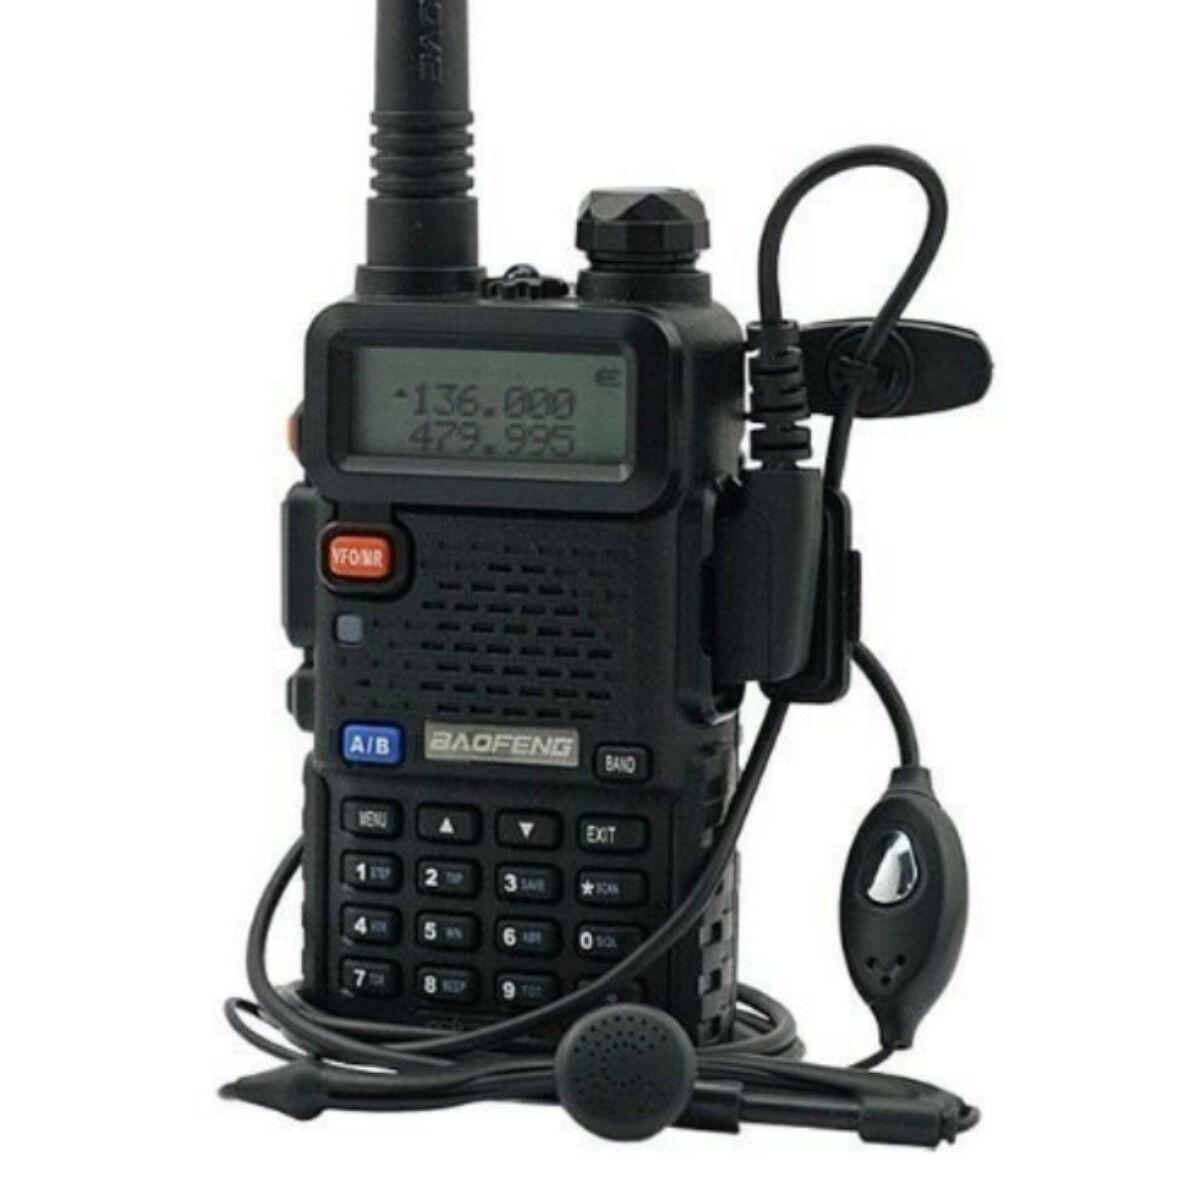 RADIO BAOFENG UV5R